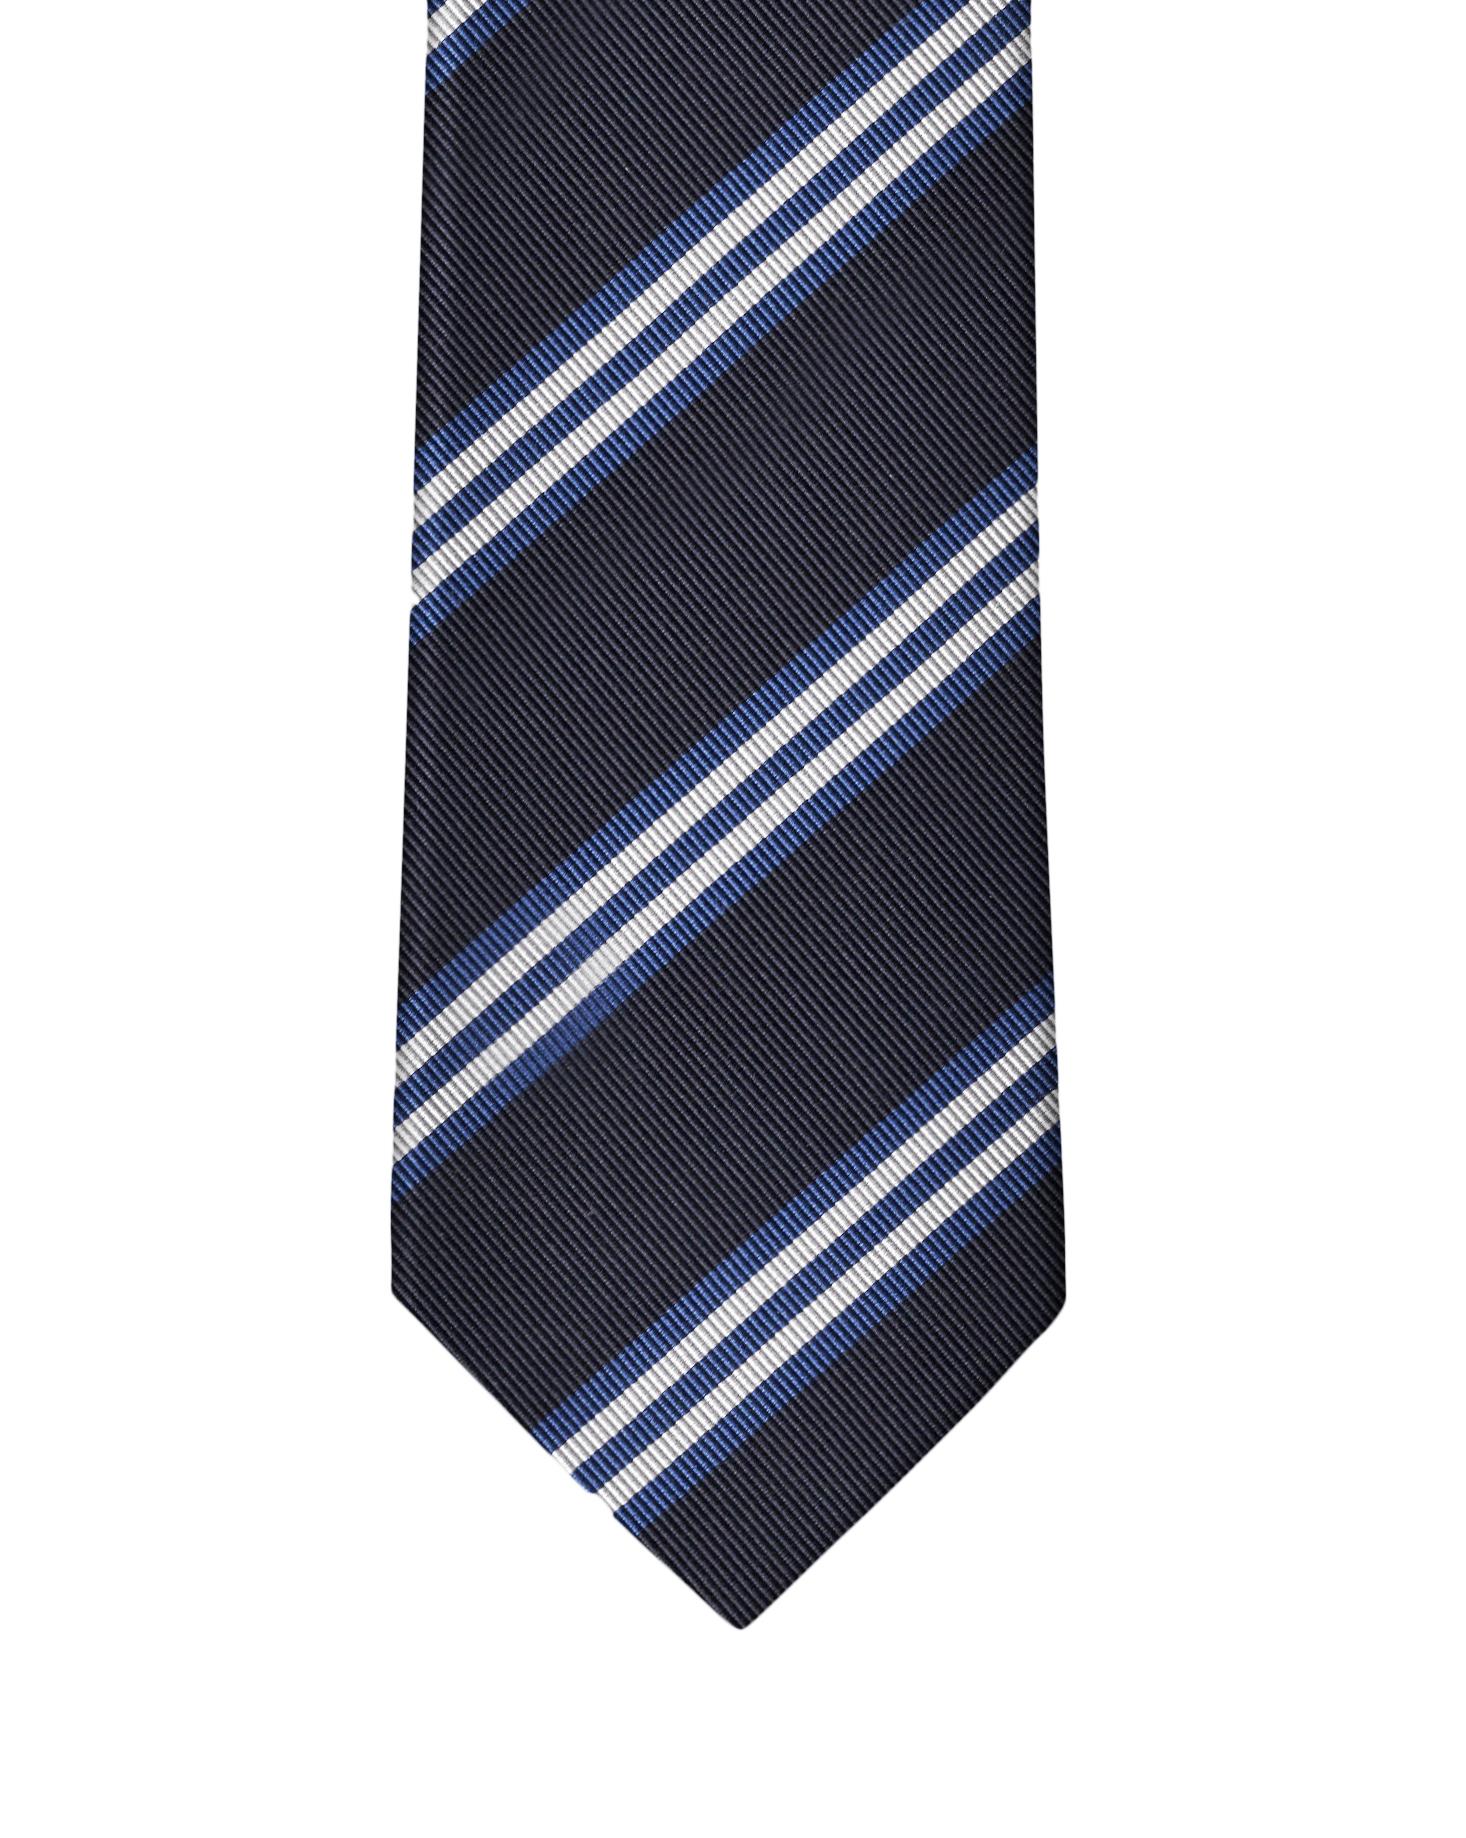 Black, Blue, & White Classic Rep Stripe Necktie